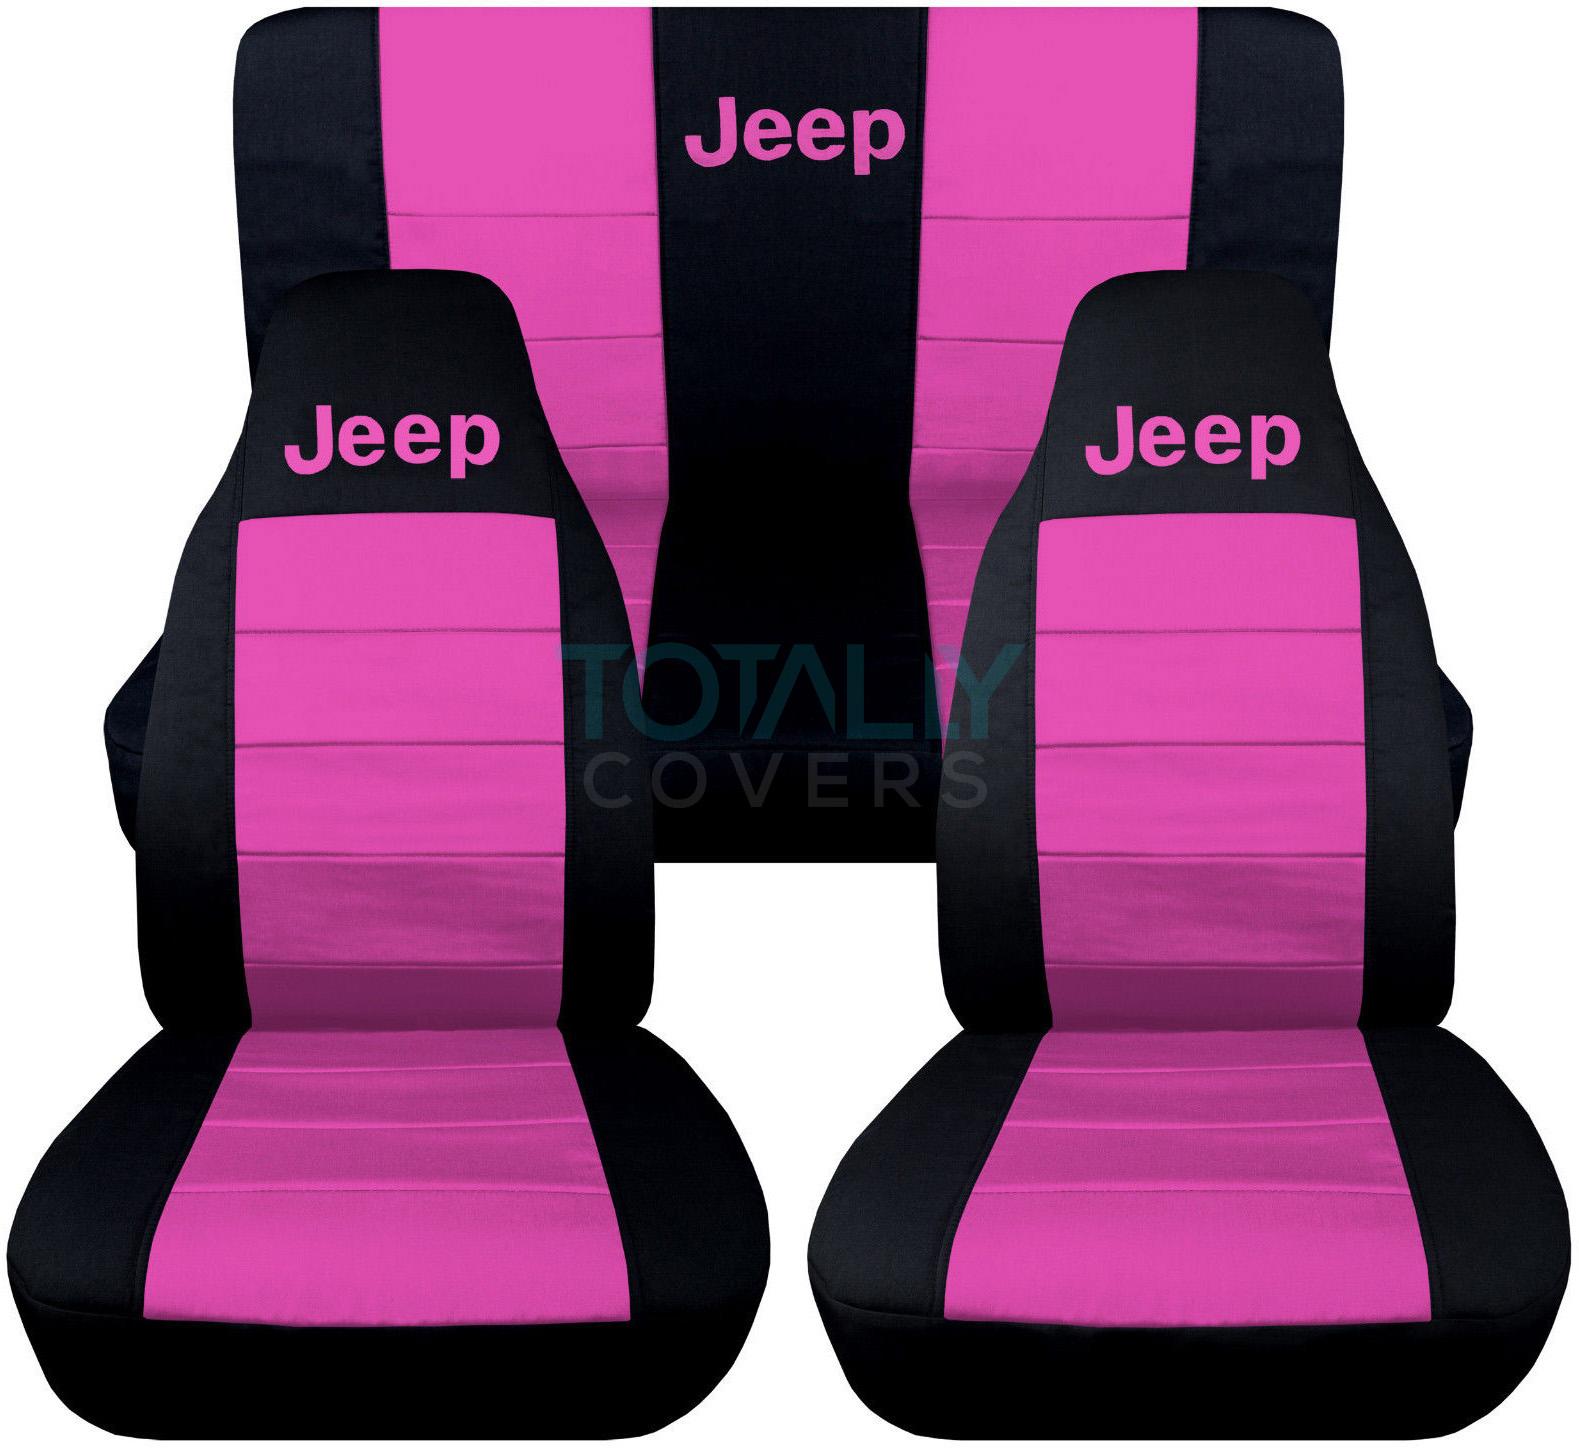 jeep wrangler yj tj jk 1987 2018 2 tone seat covers w logo front rear full set ebay. Black Bedroom Furniture Sets. Home Design Ideas